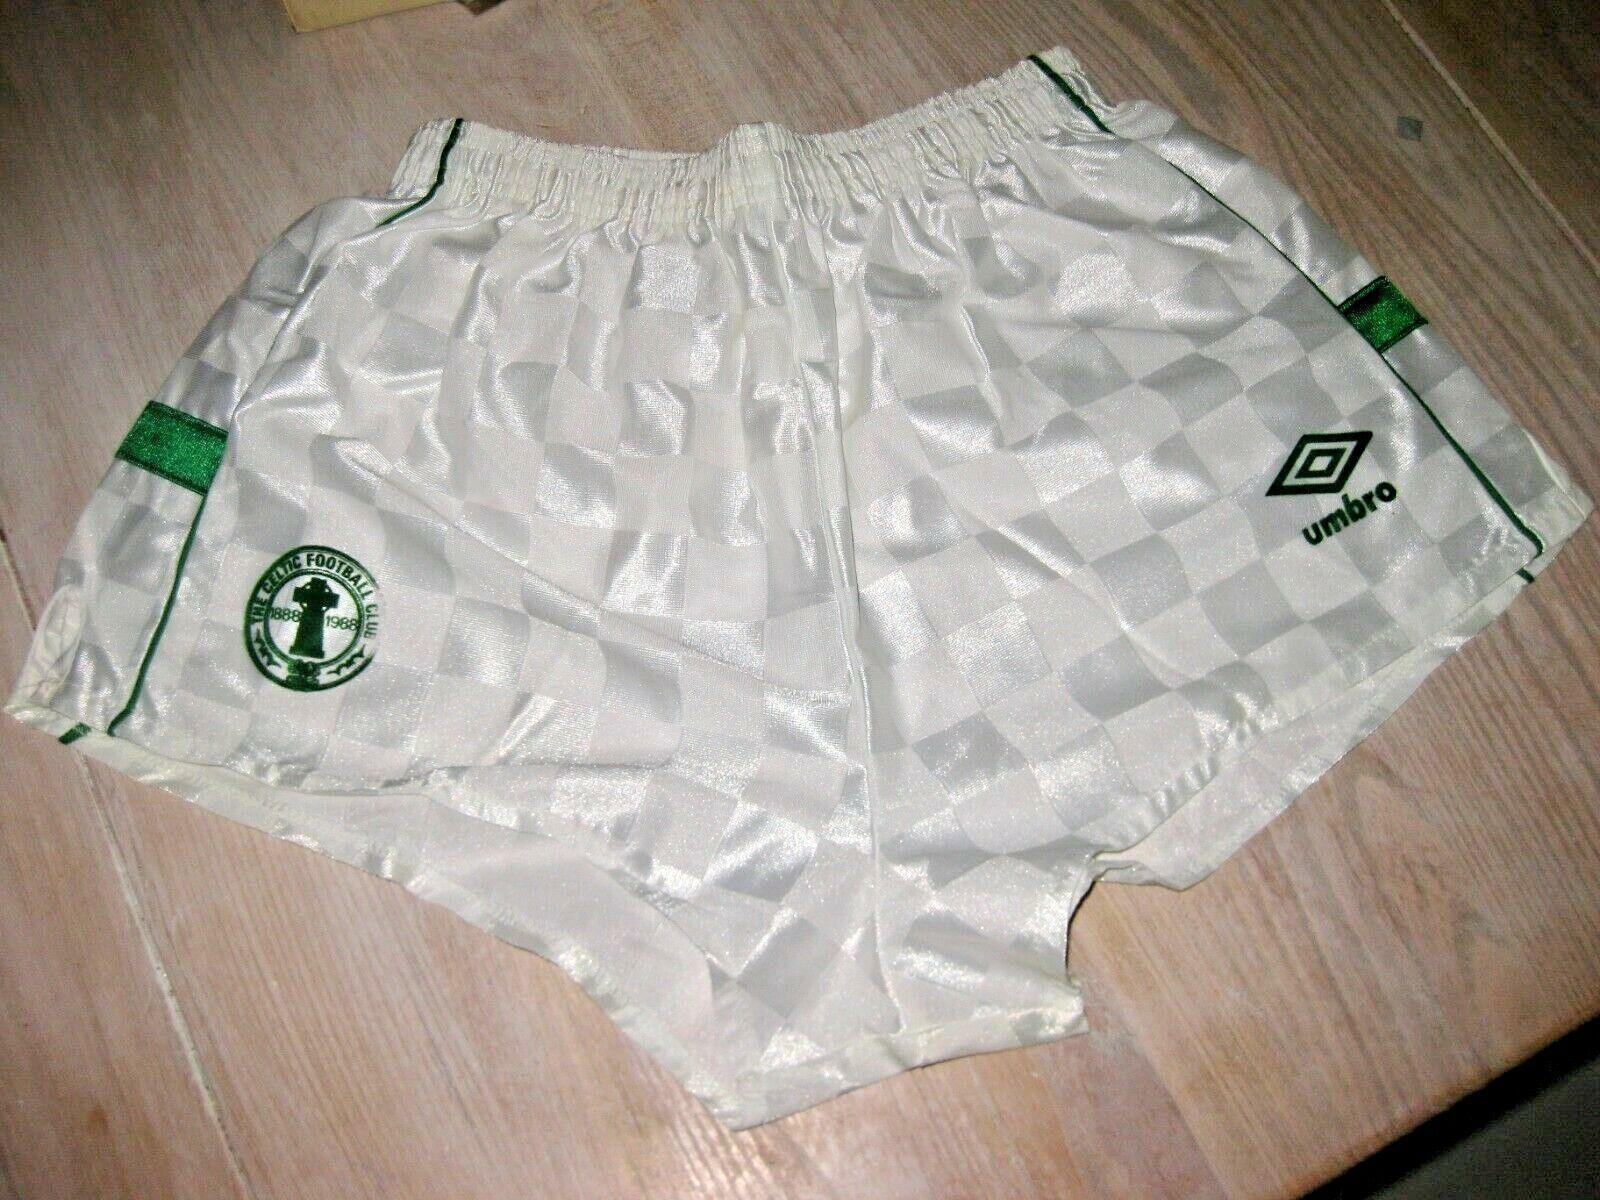 Vintage Umbridge Celtic Glasgow Shorts 80s Trikot Glanzshorts 36 tum 91 cm Shirt